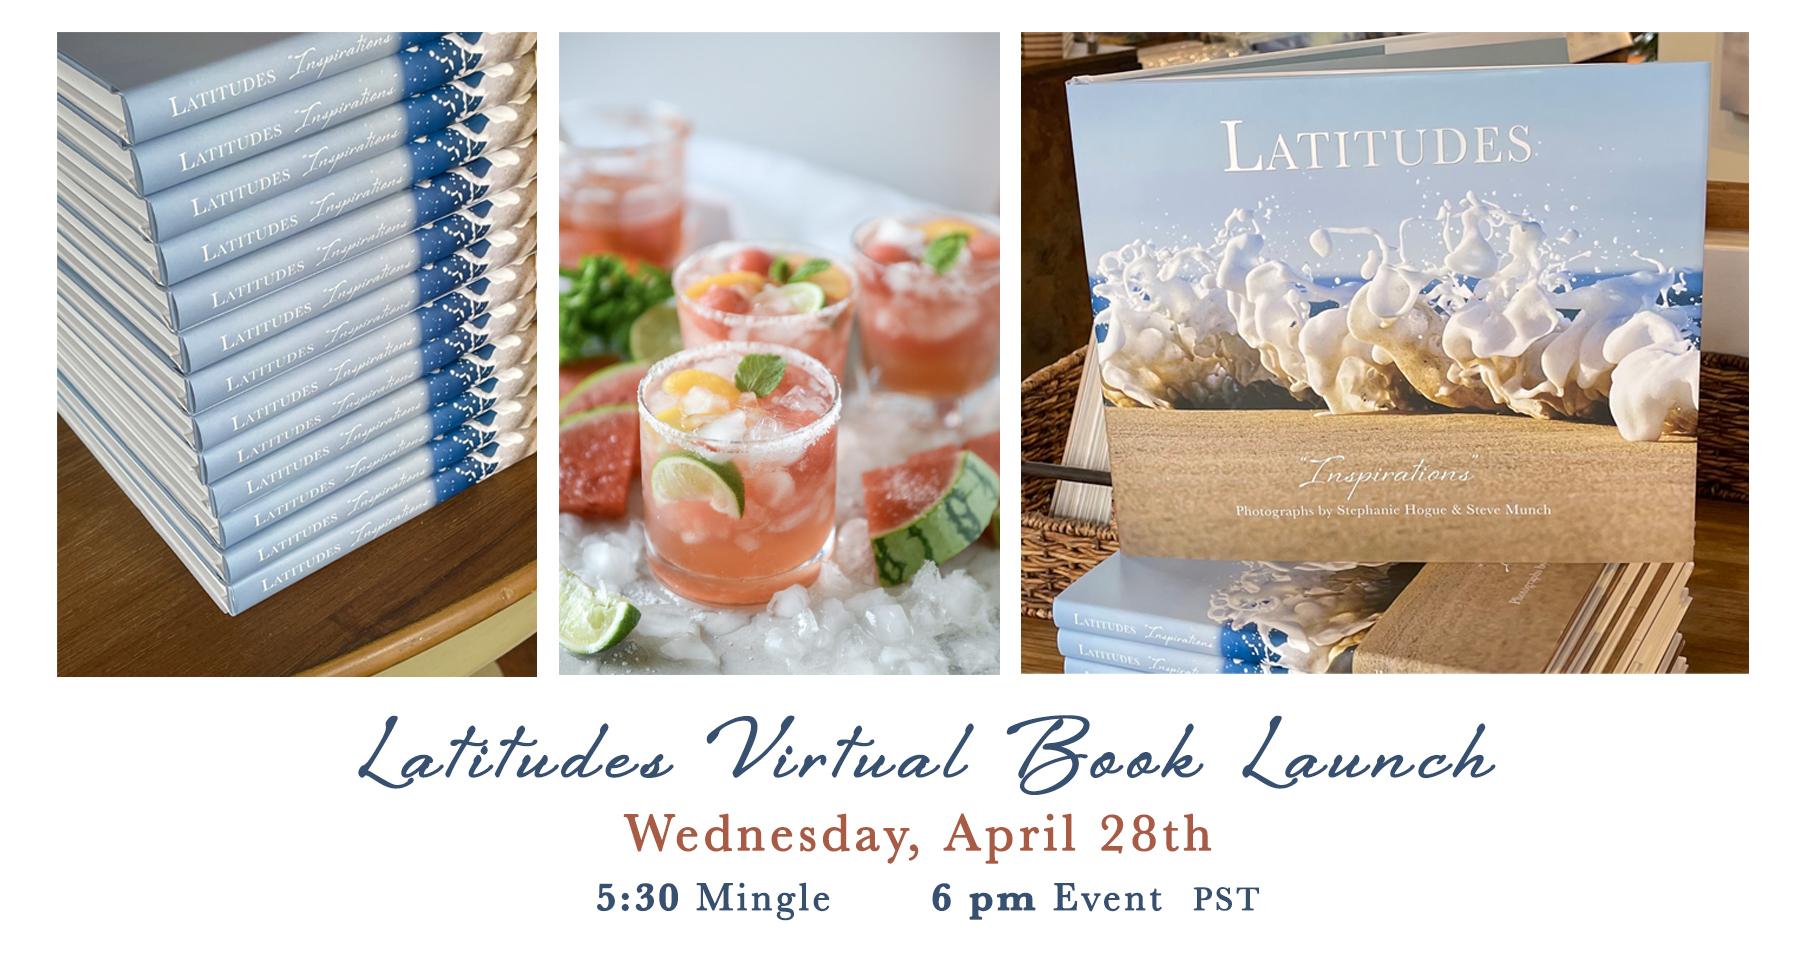 Book Launch Party Invitation April 28, 2021